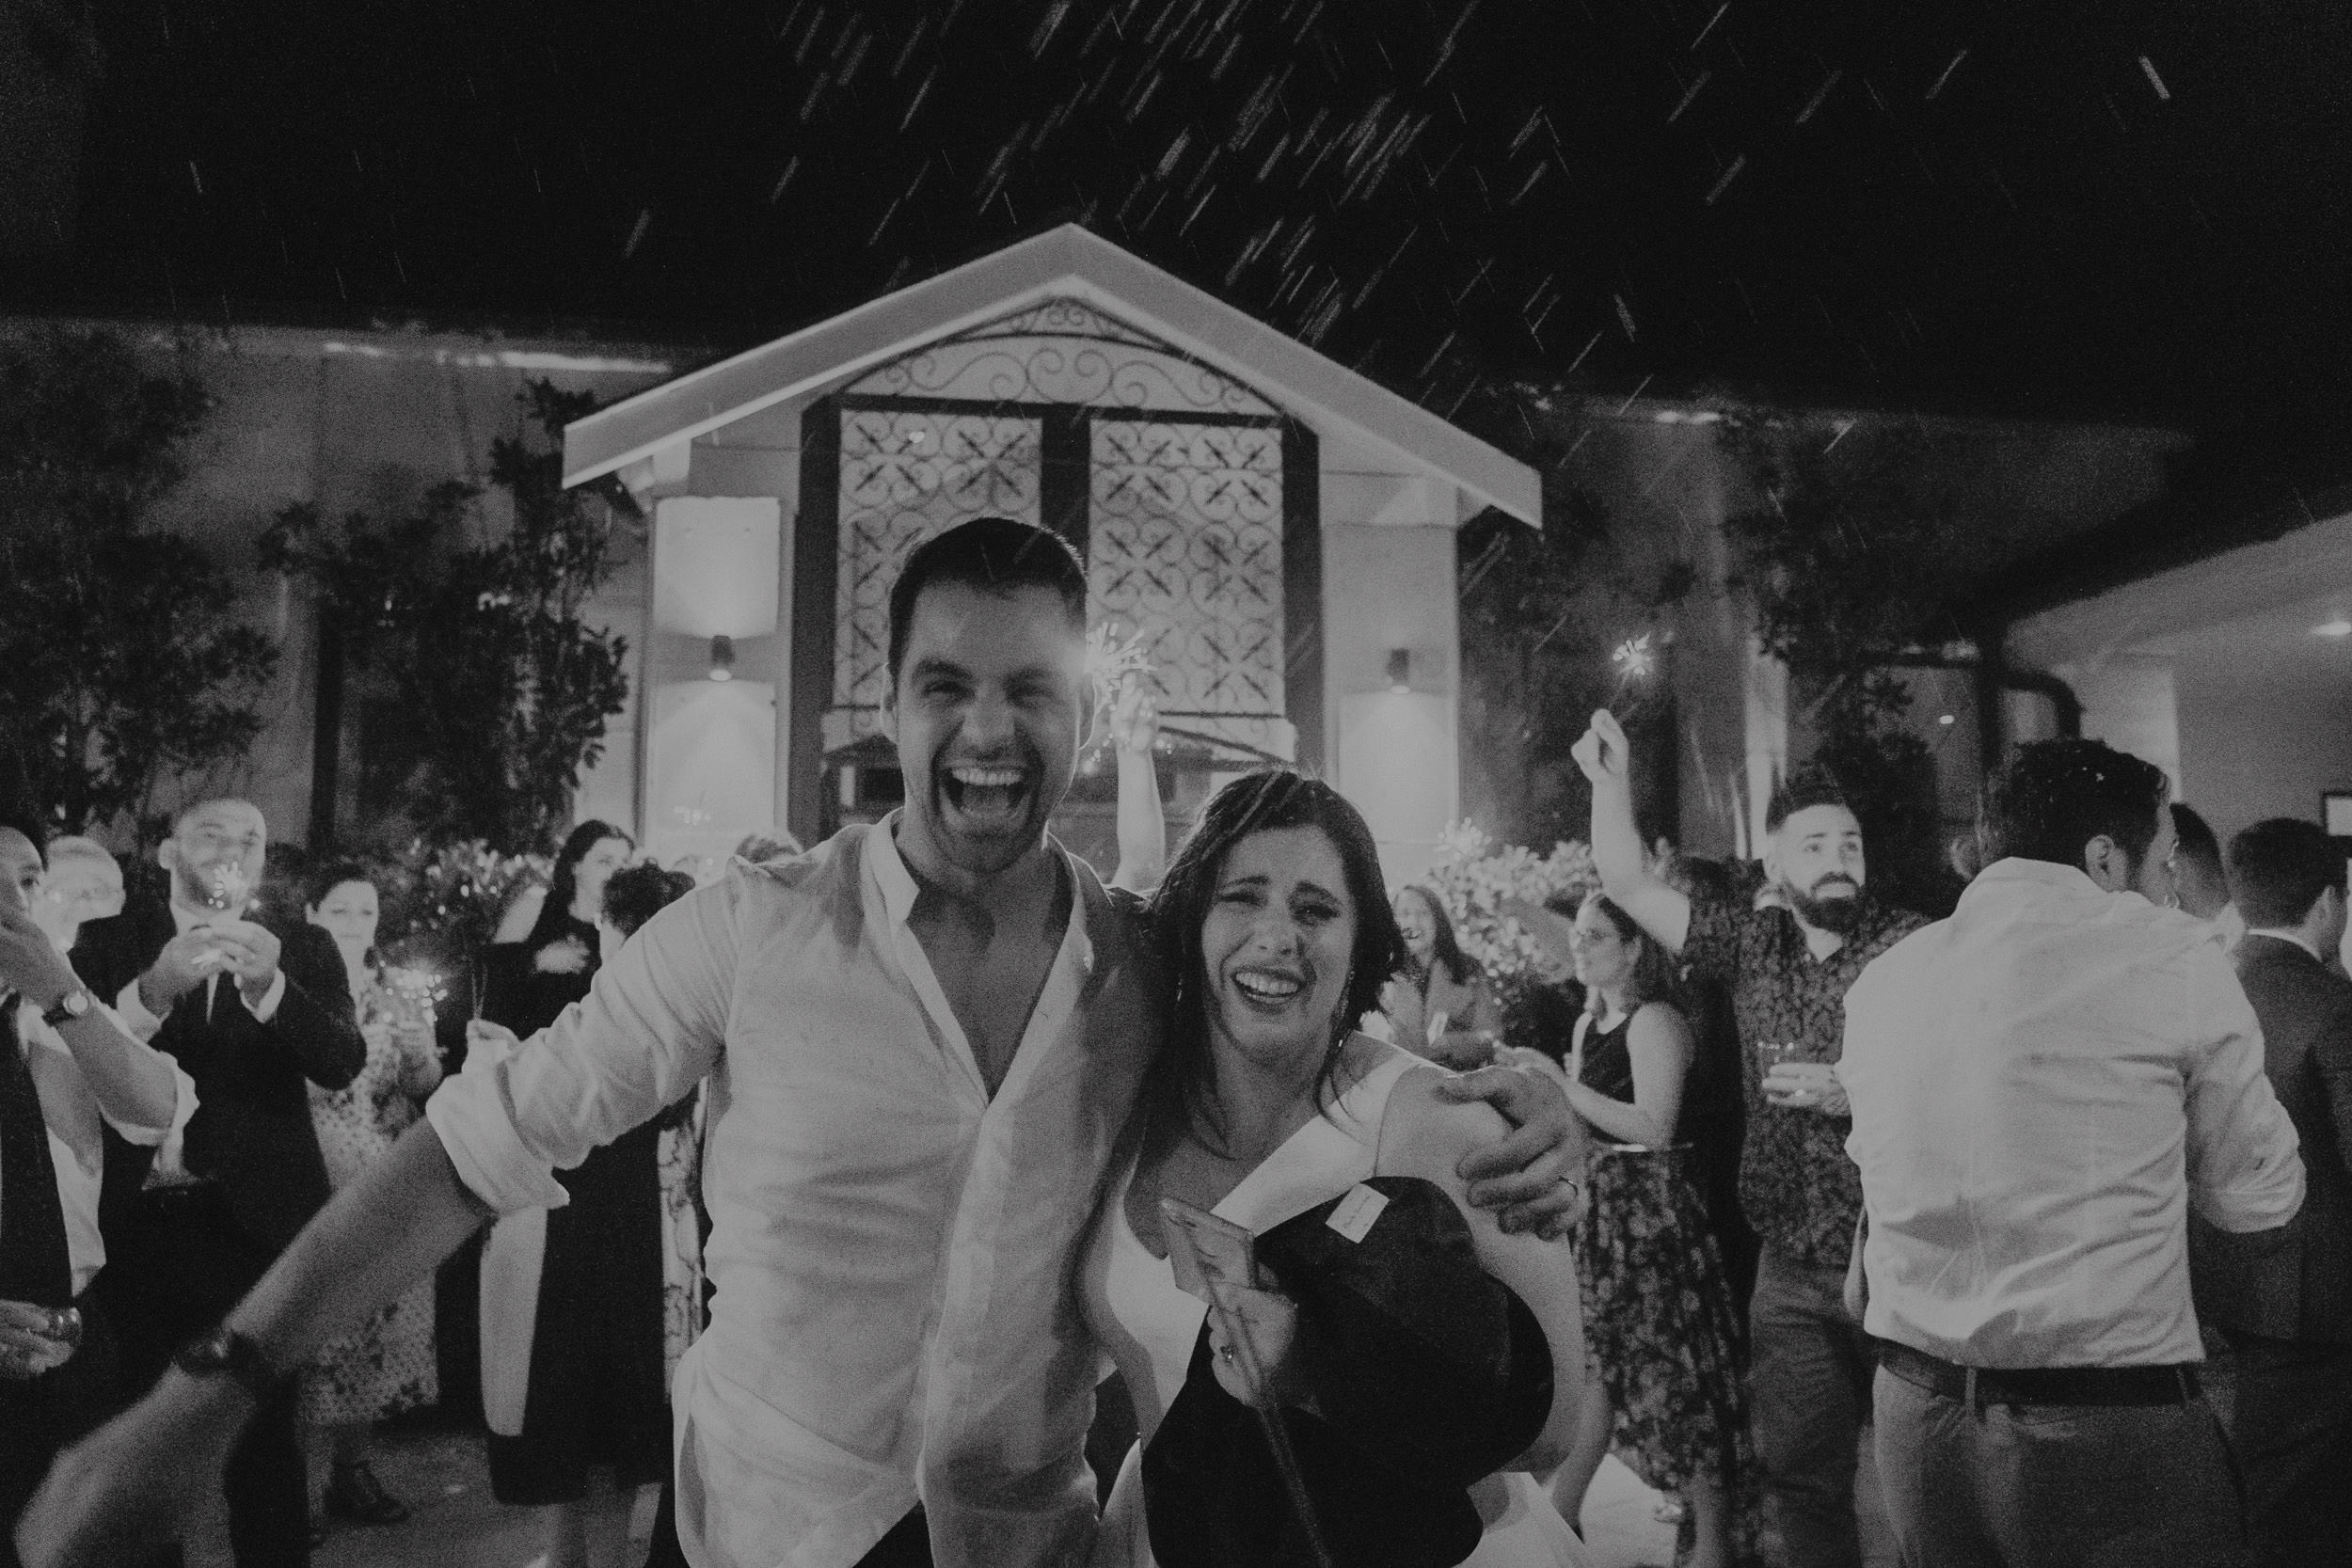 s+j_top_elopement wedding photography_kings & thieves_blog - 621.jpg